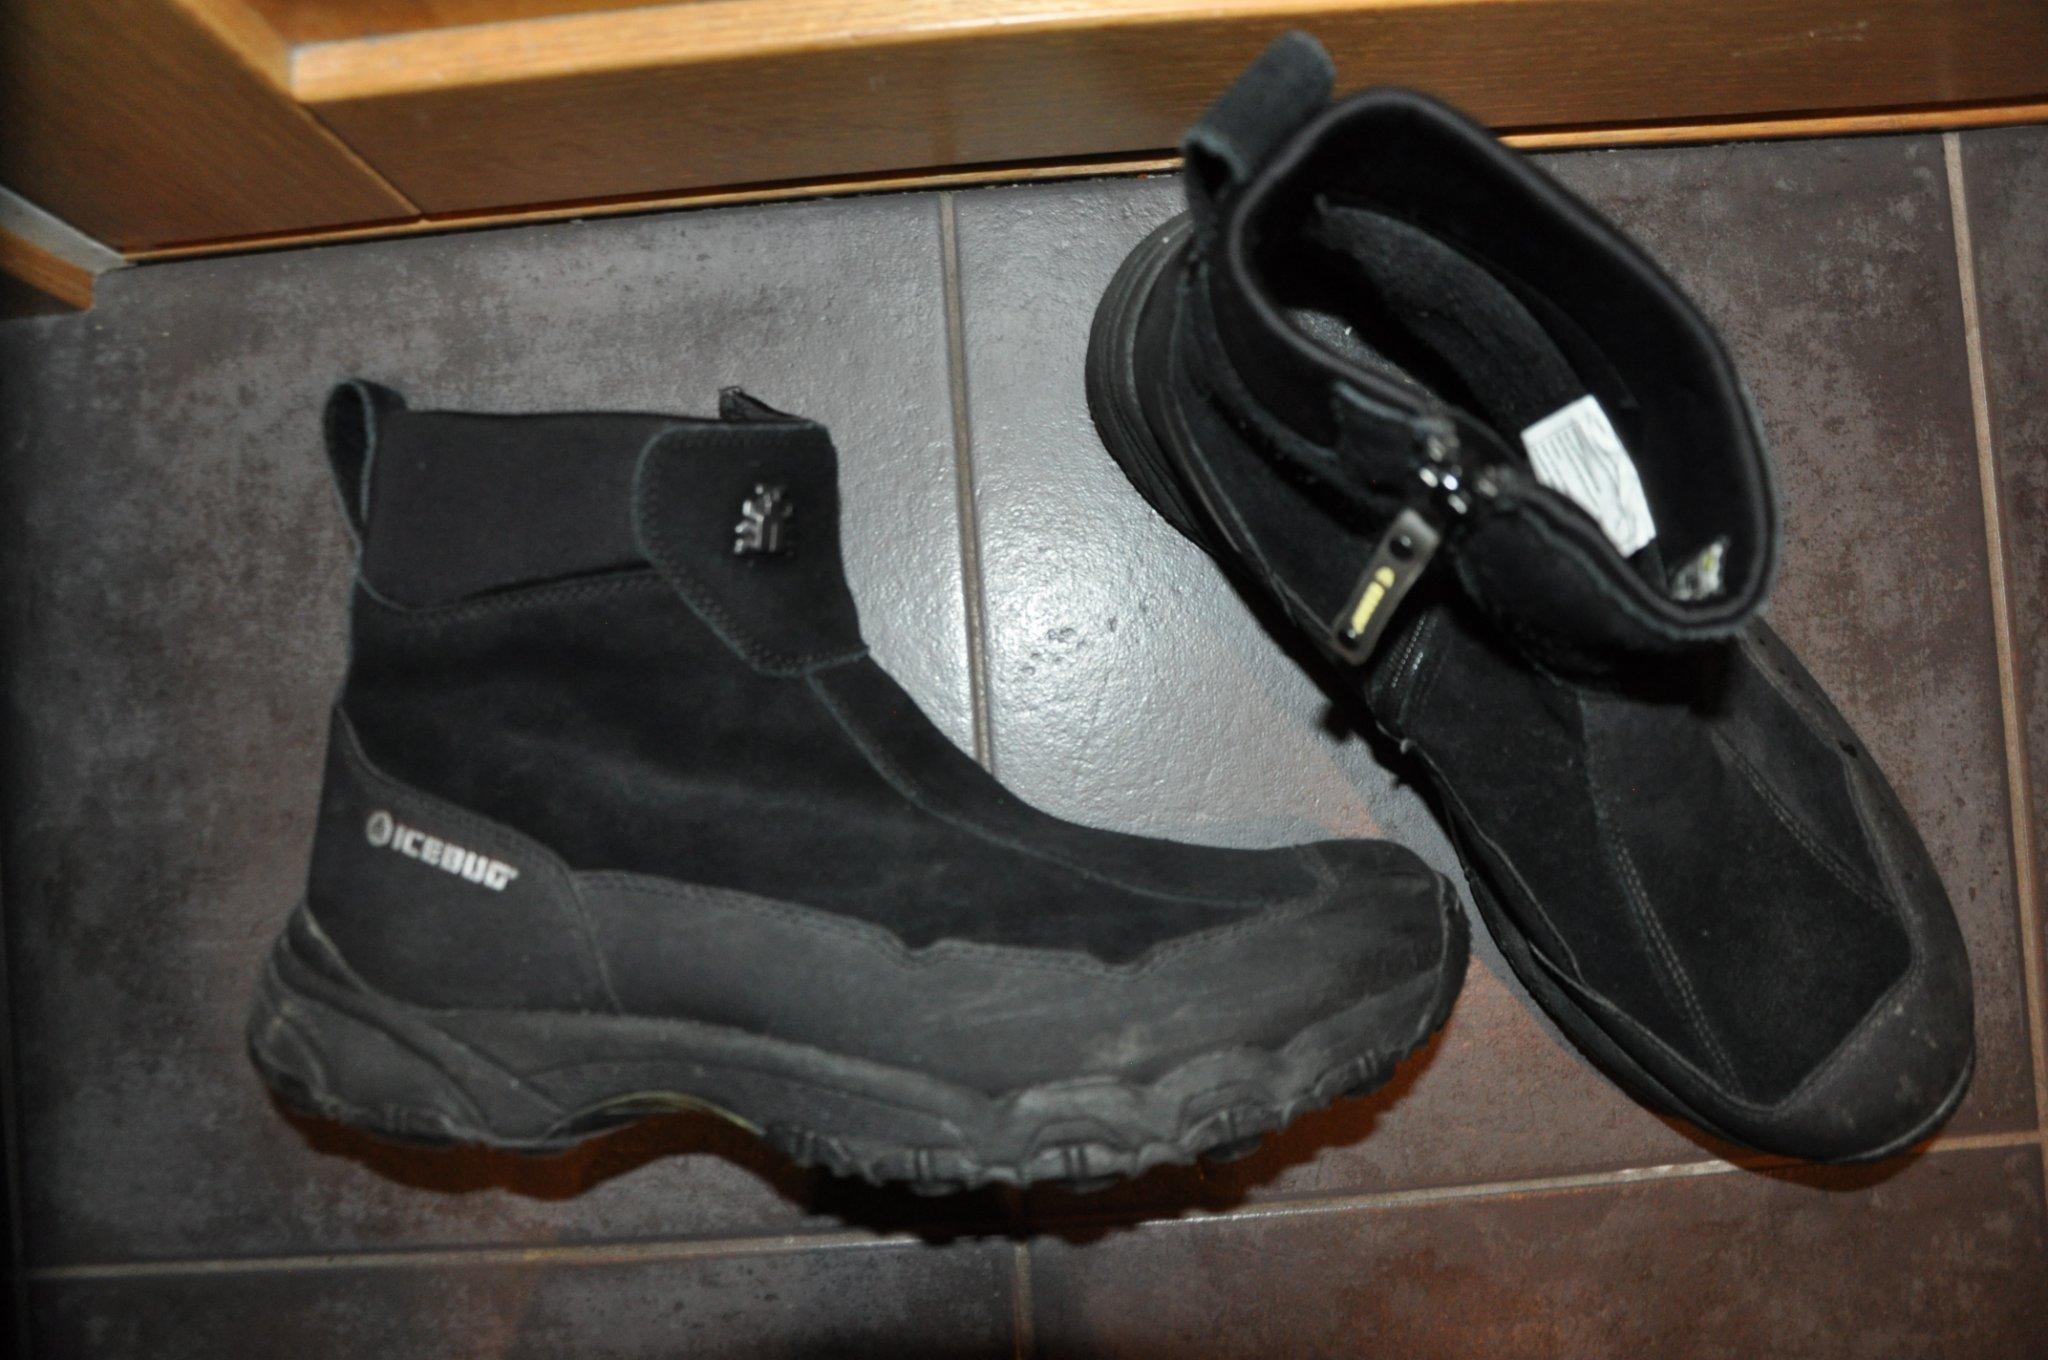 skor med inbyggda broddar